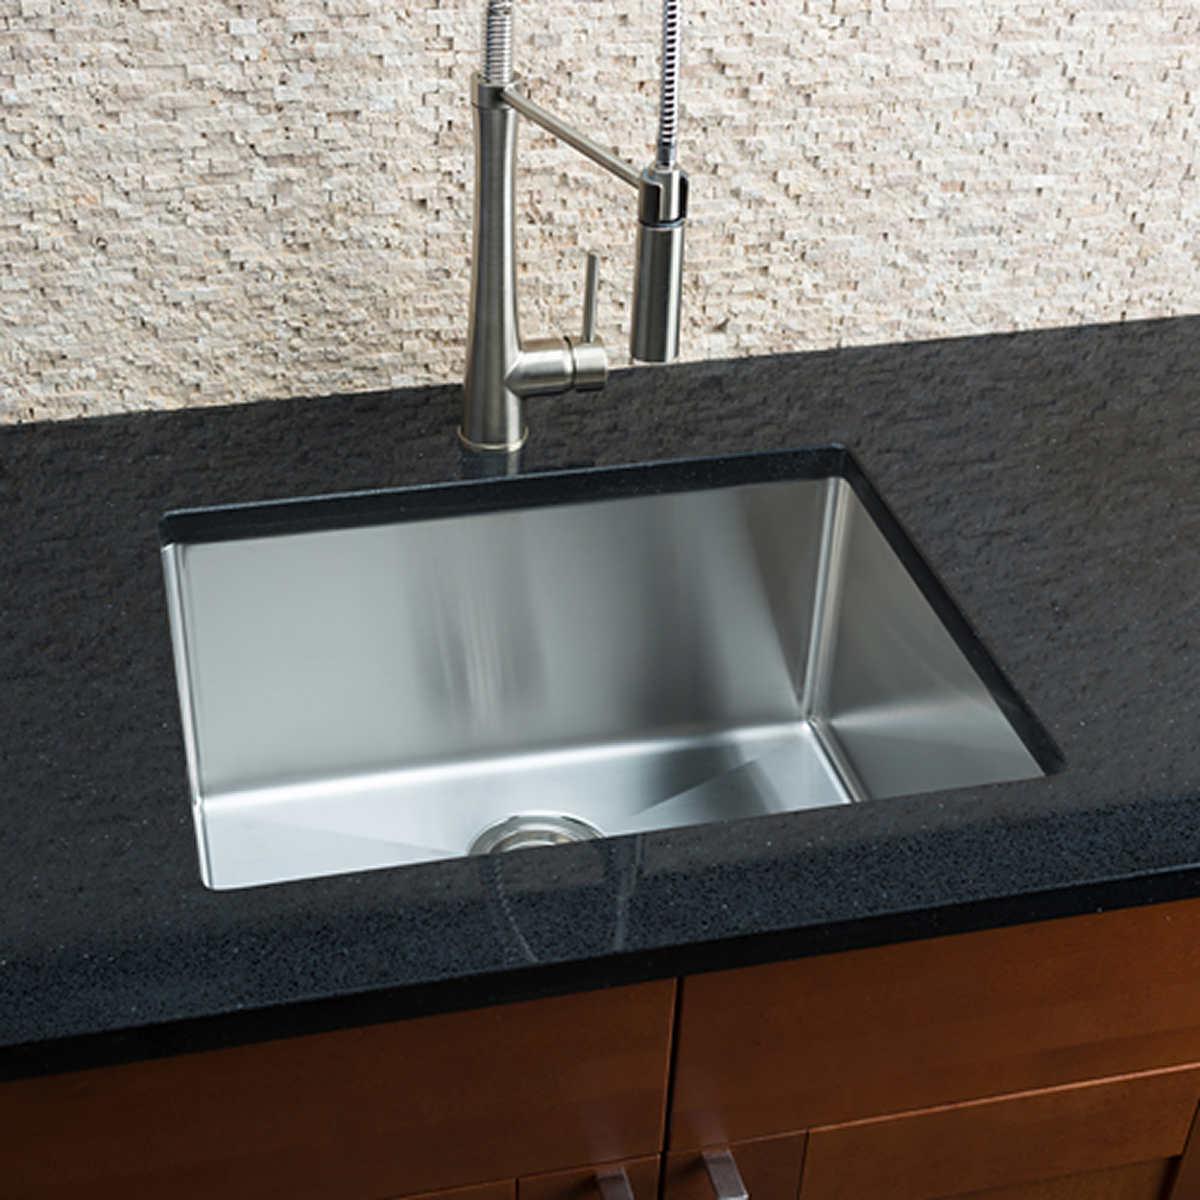 hahn chef series handmade extra large single bowl sink